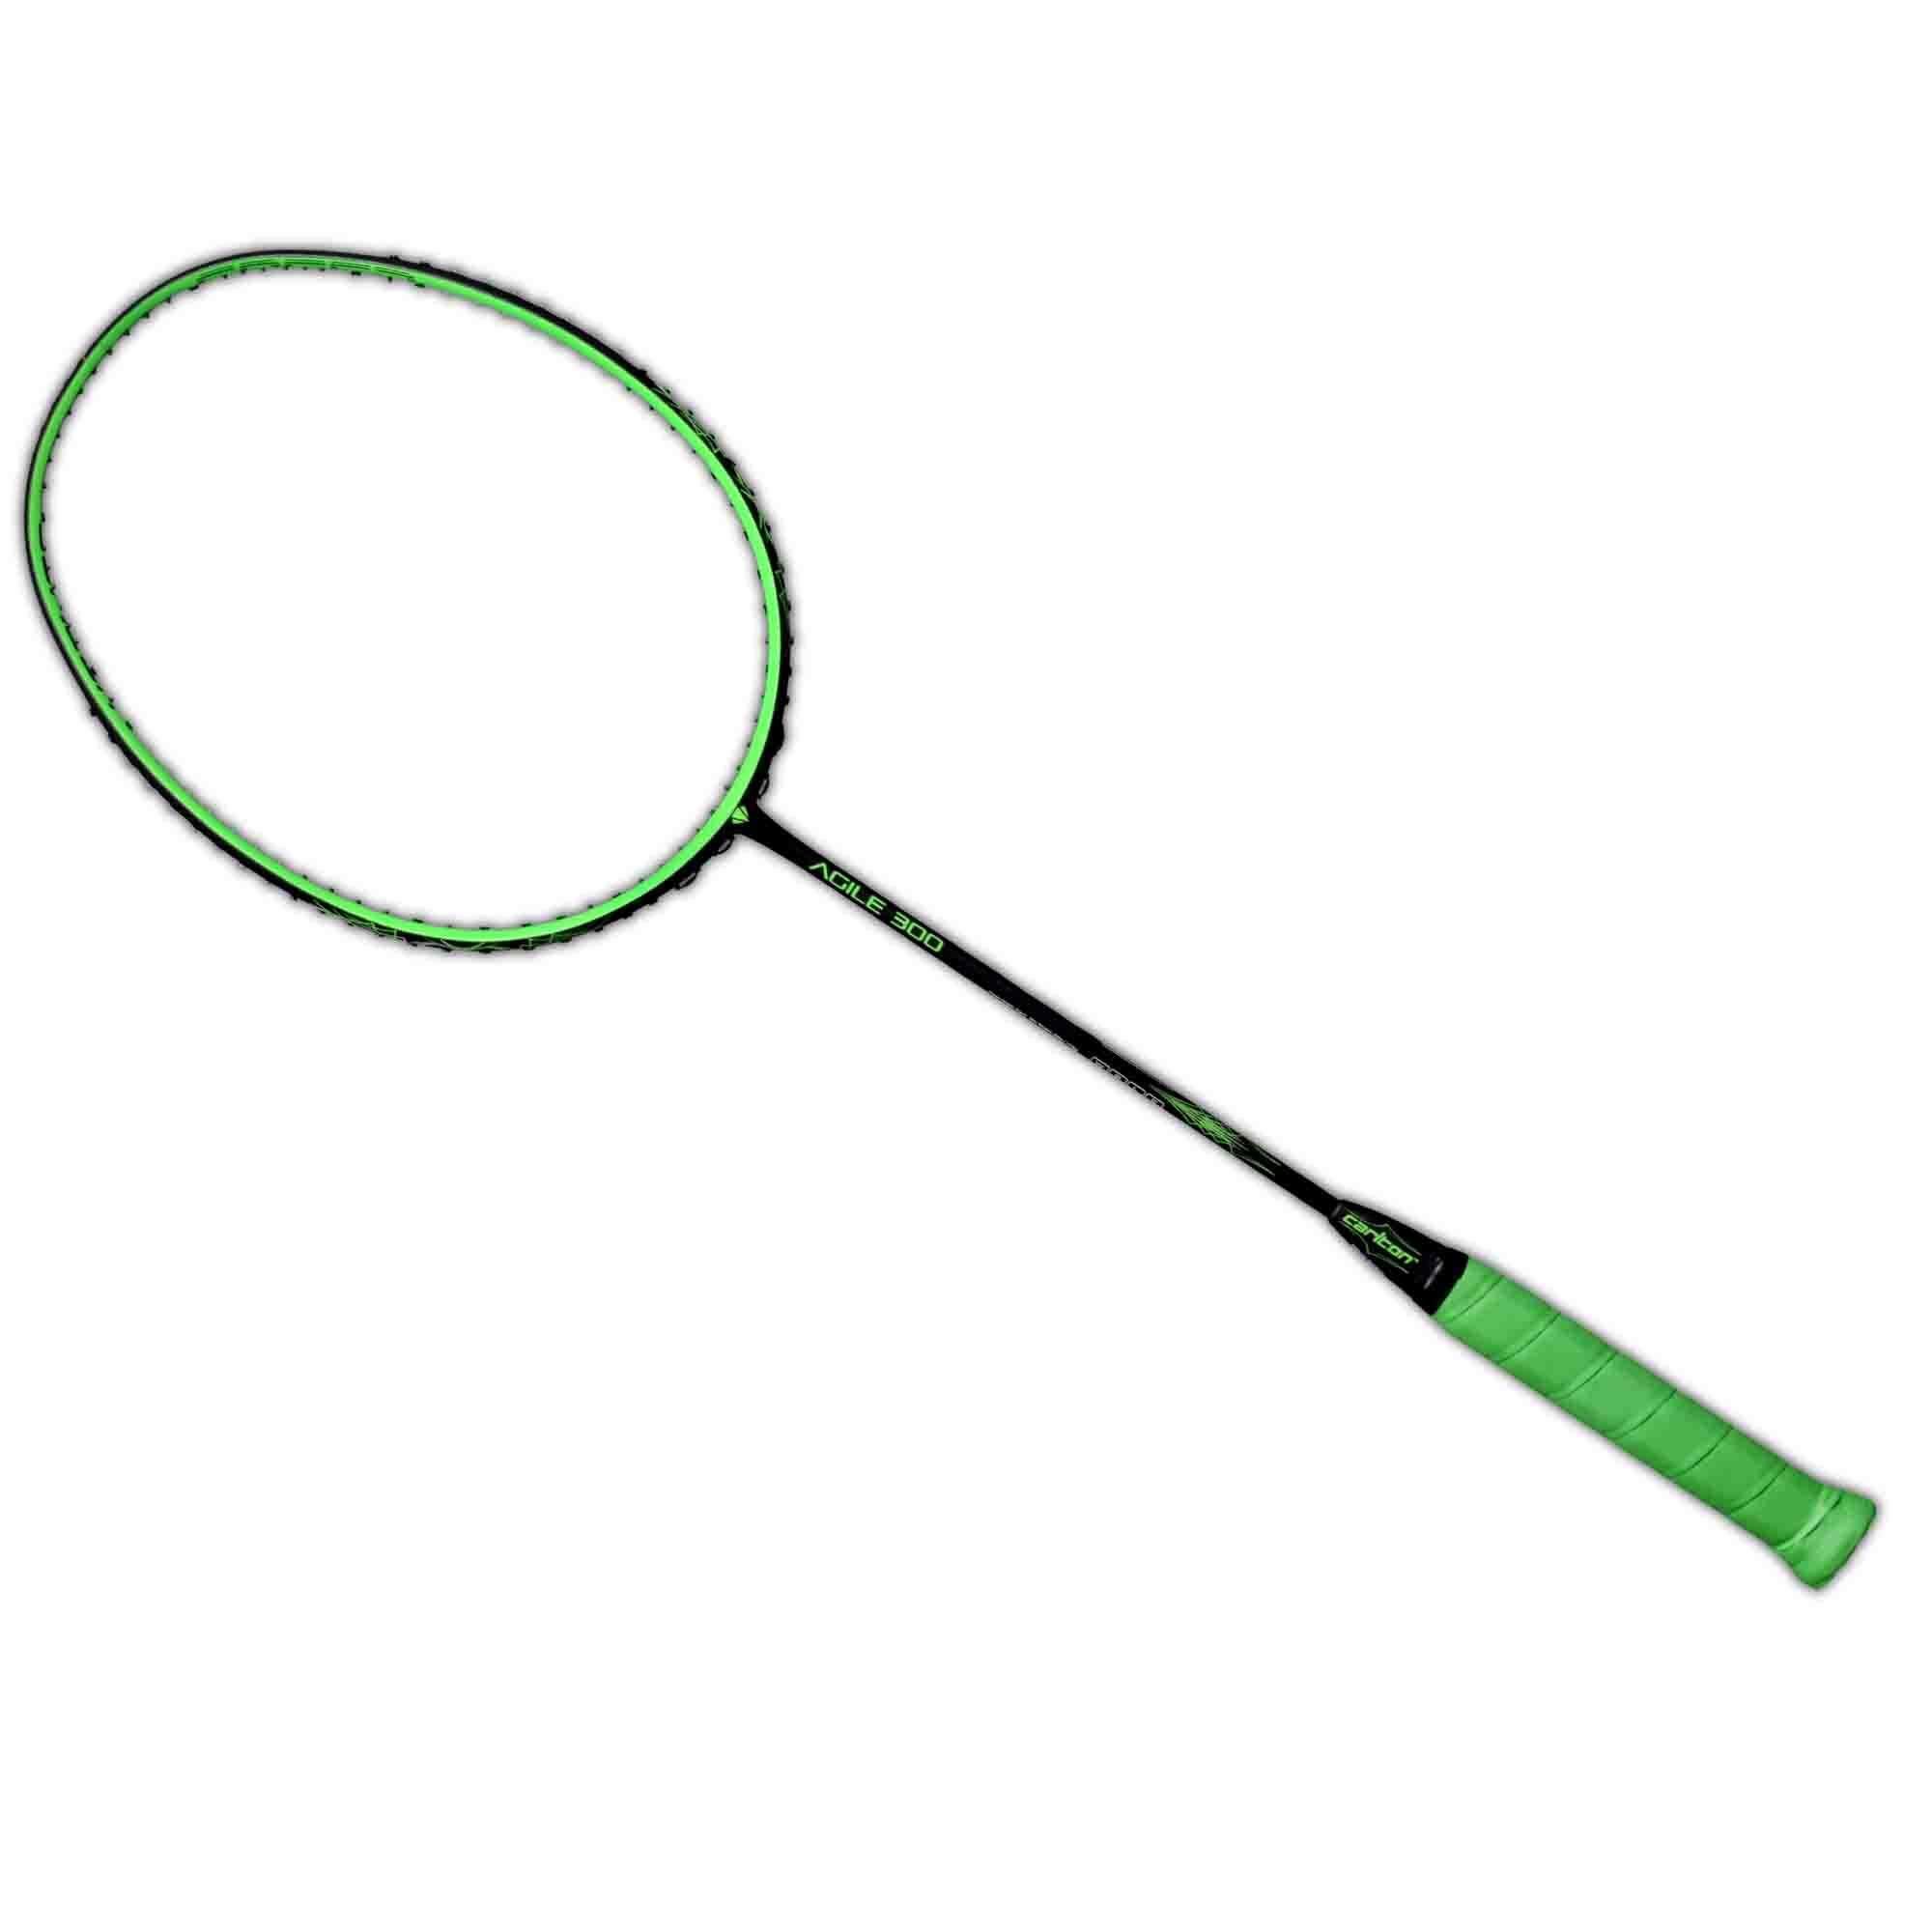 Carlton Badminton Racket Agile 300